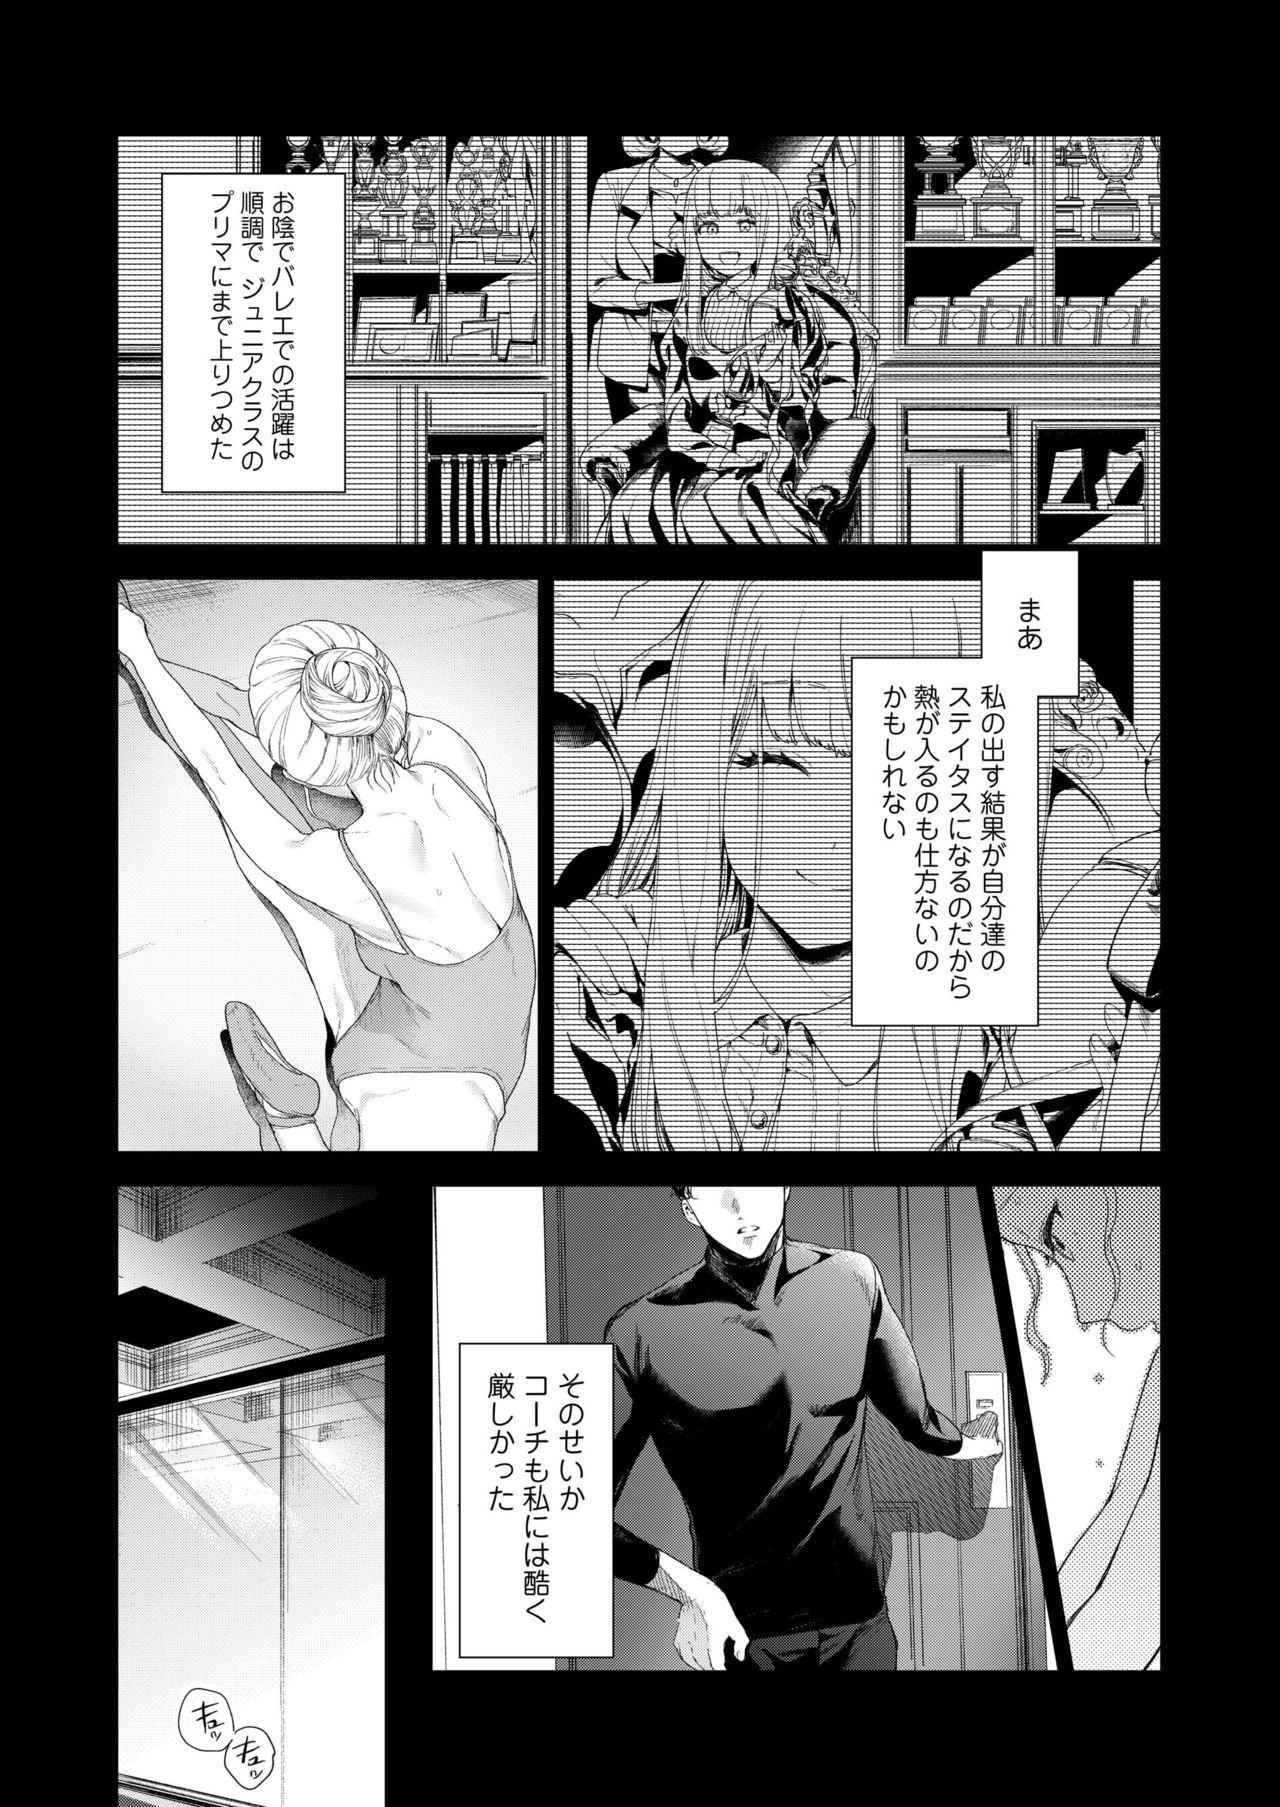 COMIC AOHA 2019 Haru 35